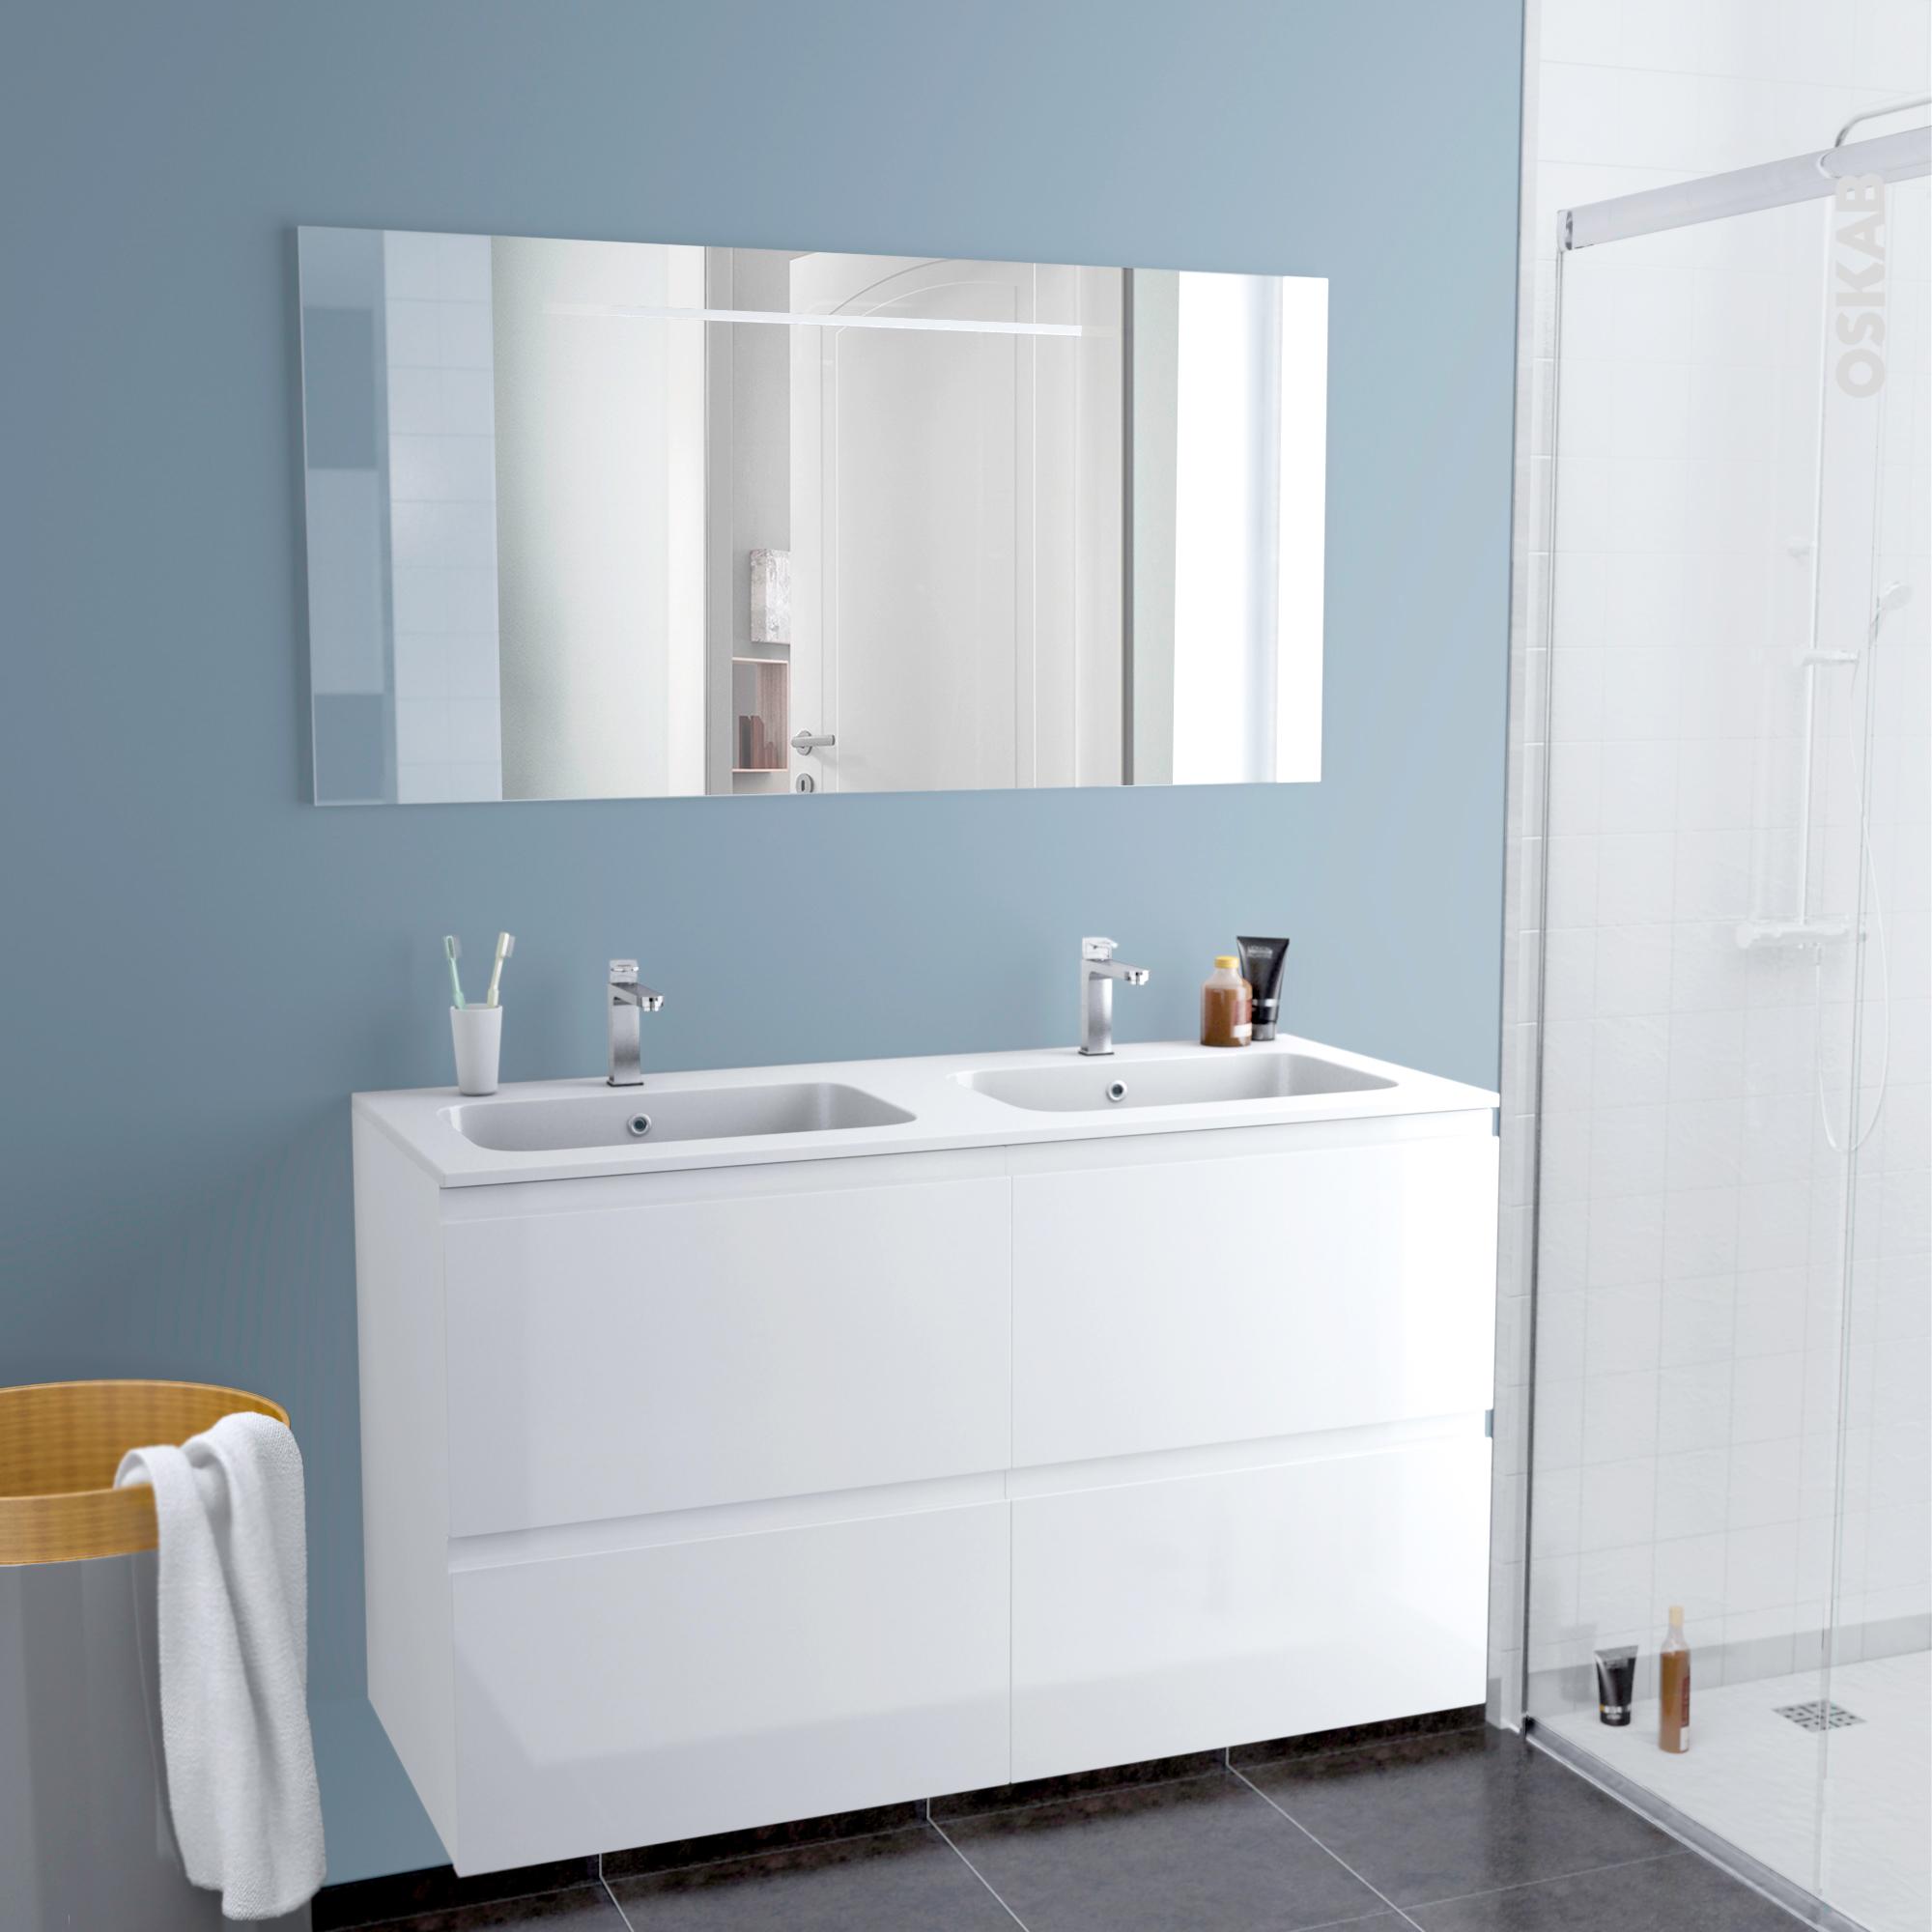 5 beau meuble salle de bain double vasque 140 cm image for Ensemble salle de bain double vasque